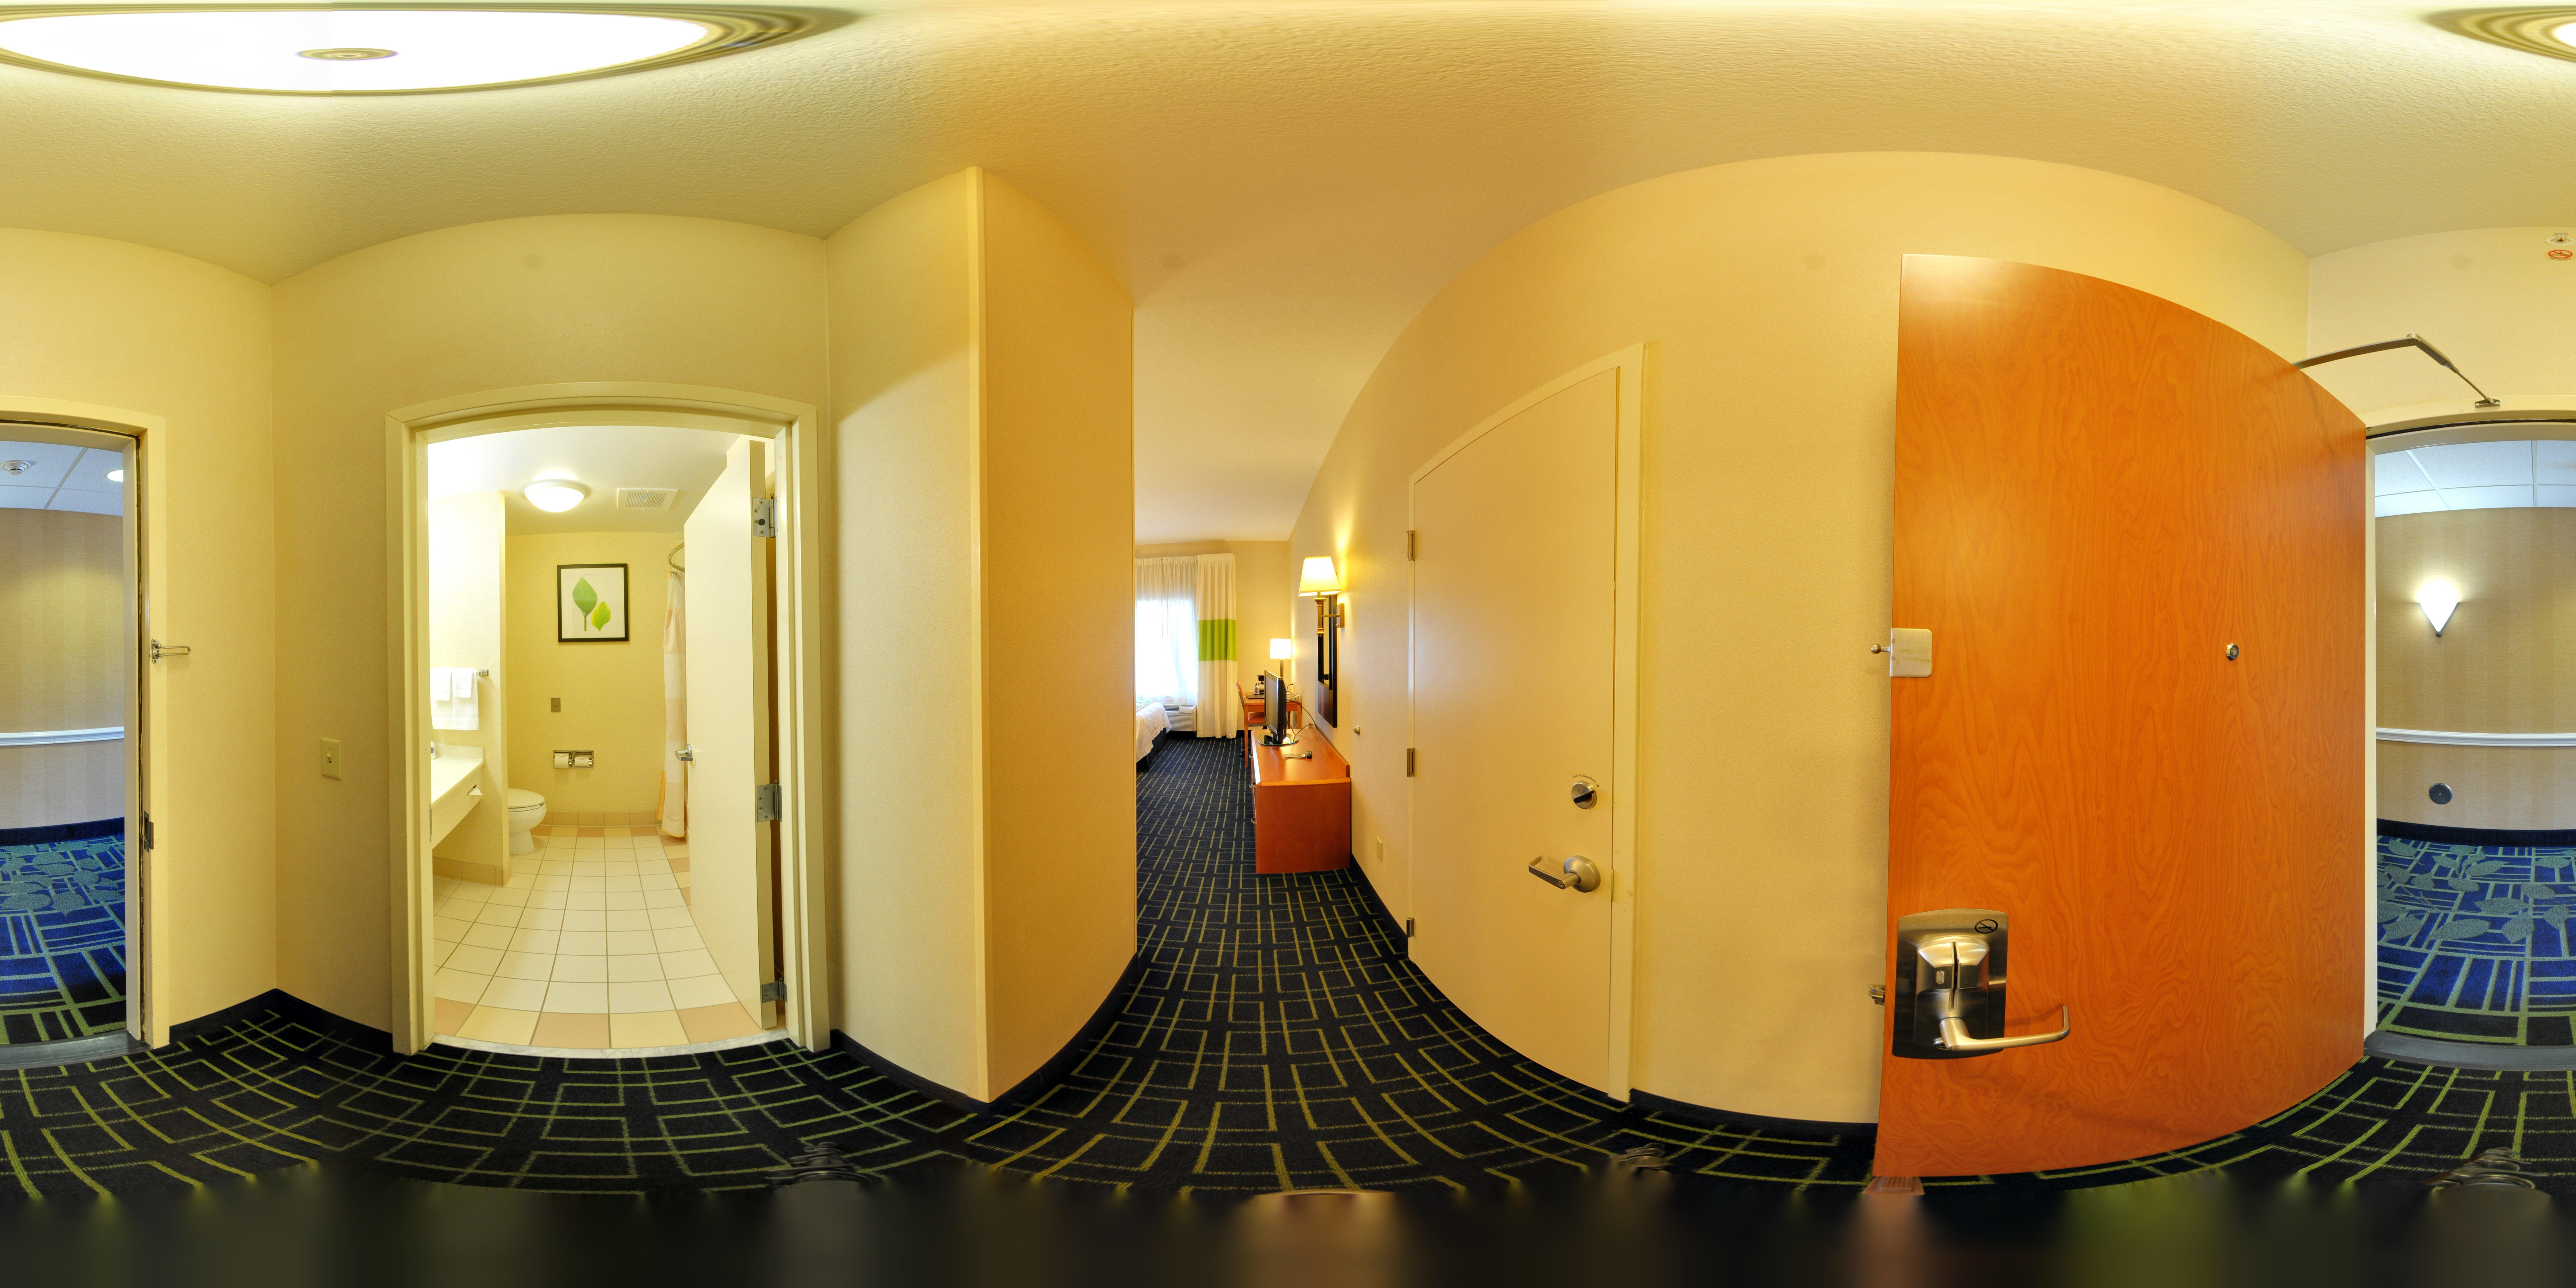 Fairfield Inn & Suites by Marriott Akron South image 39